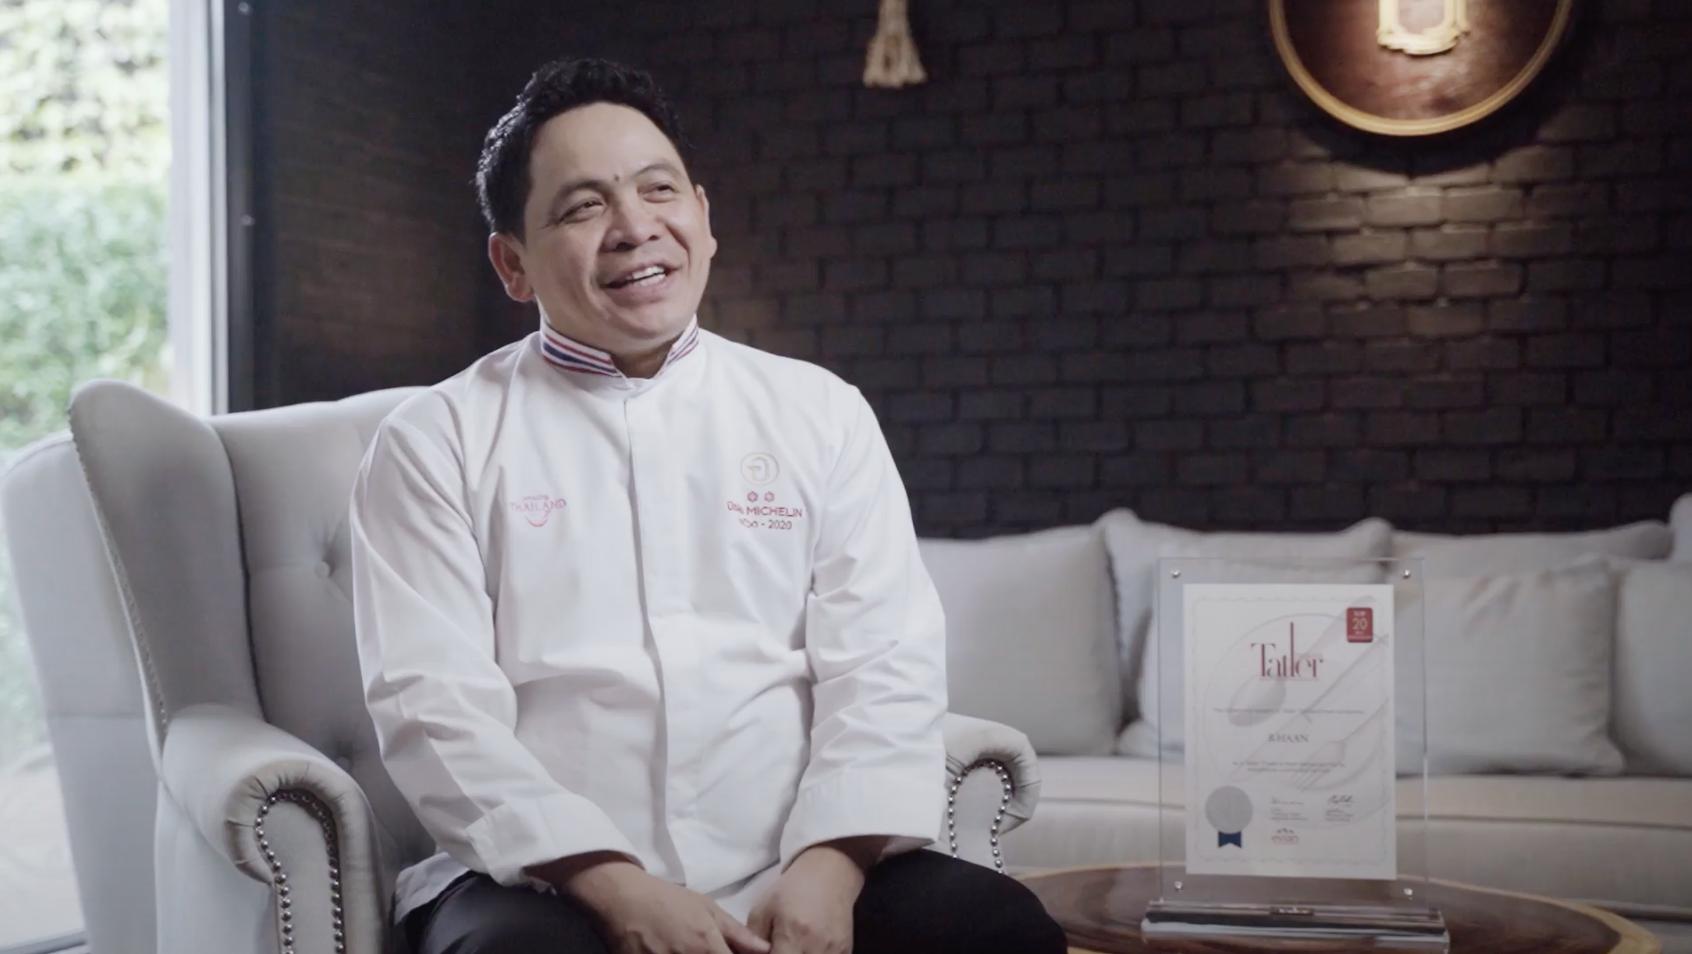 Chef Chumpol Unlocks The Full Potential Of Thai Cuisine At His Restaurant R-Haan